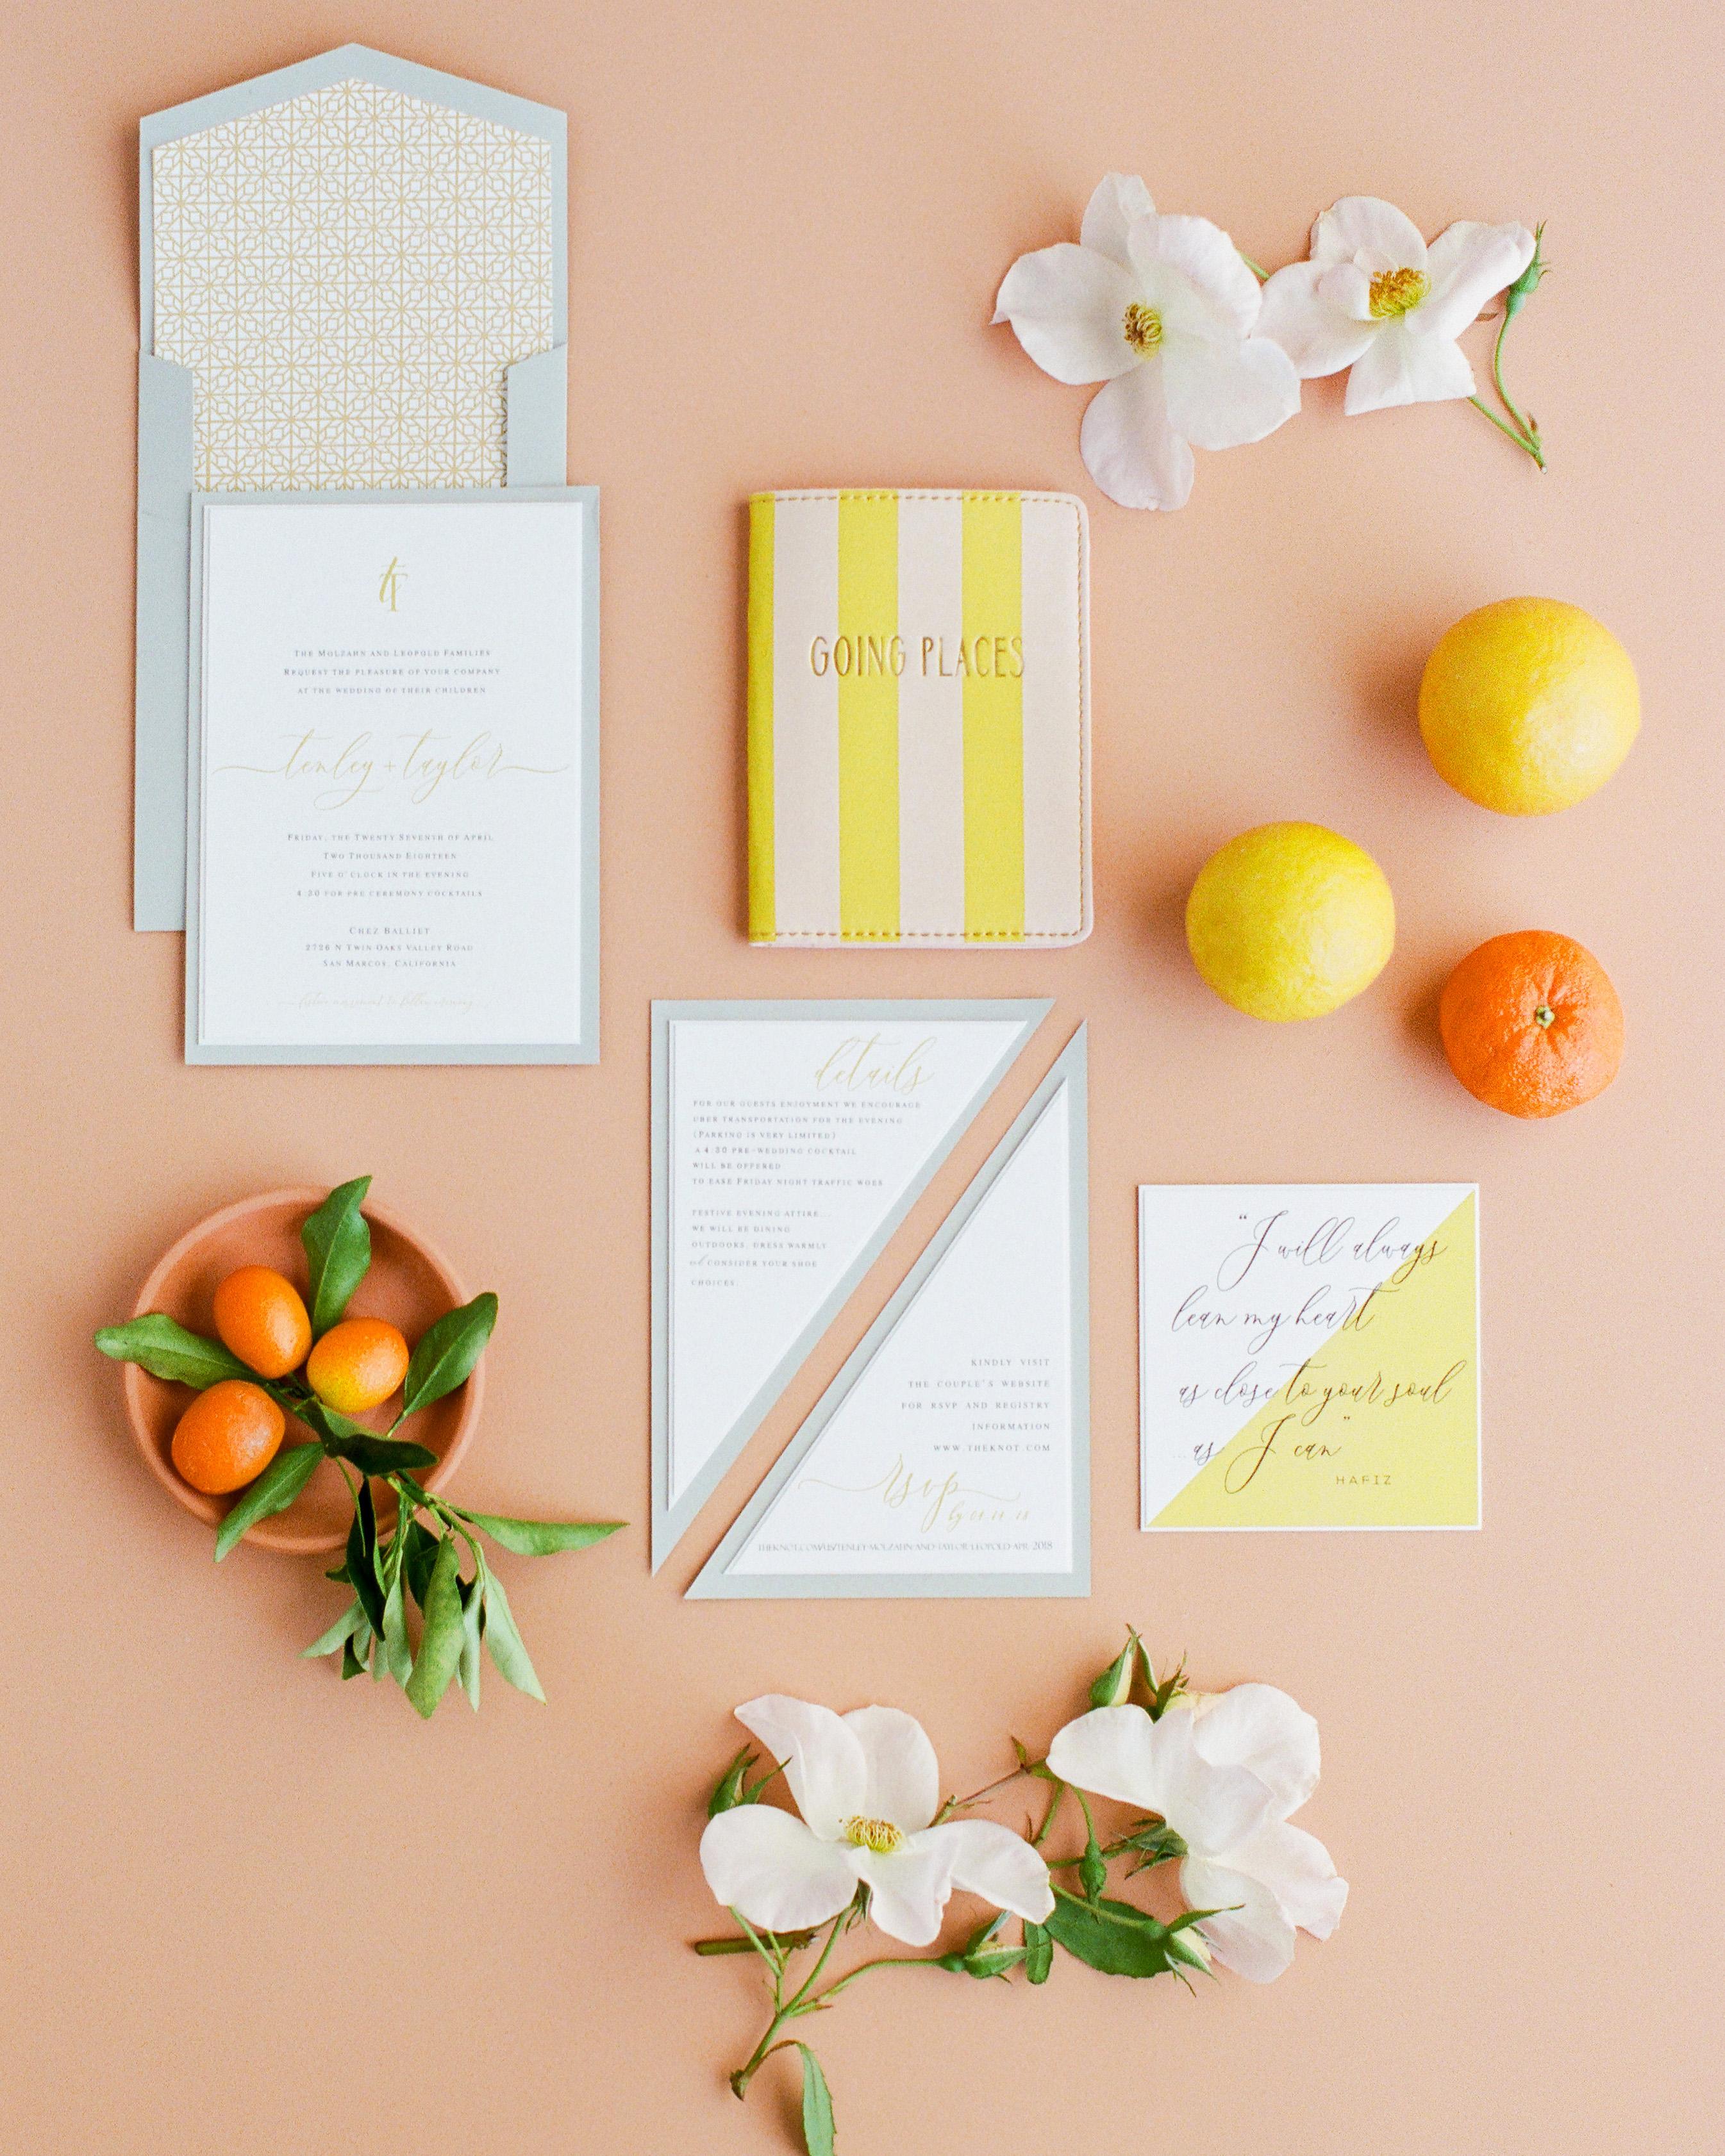 Tenley molzahn taylor leopold wedding invitations orange